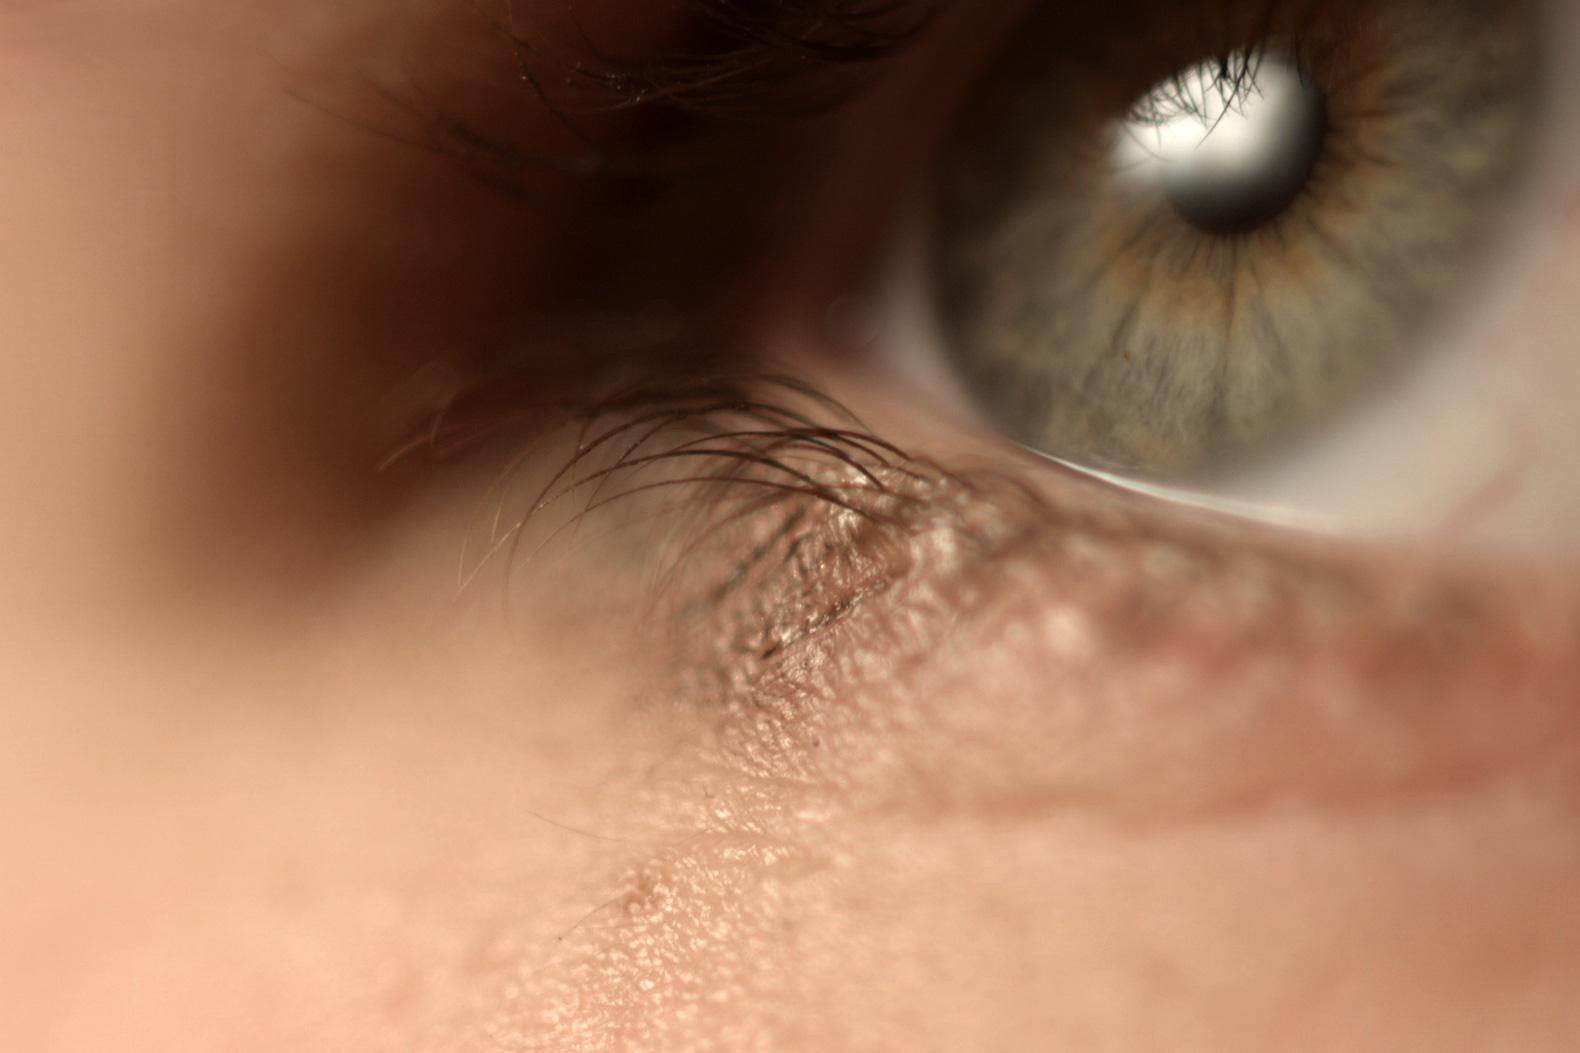 Ilona Sagar, 'Haptic Skins of a Glass Eye', 2015, video still. Tenderpixel.